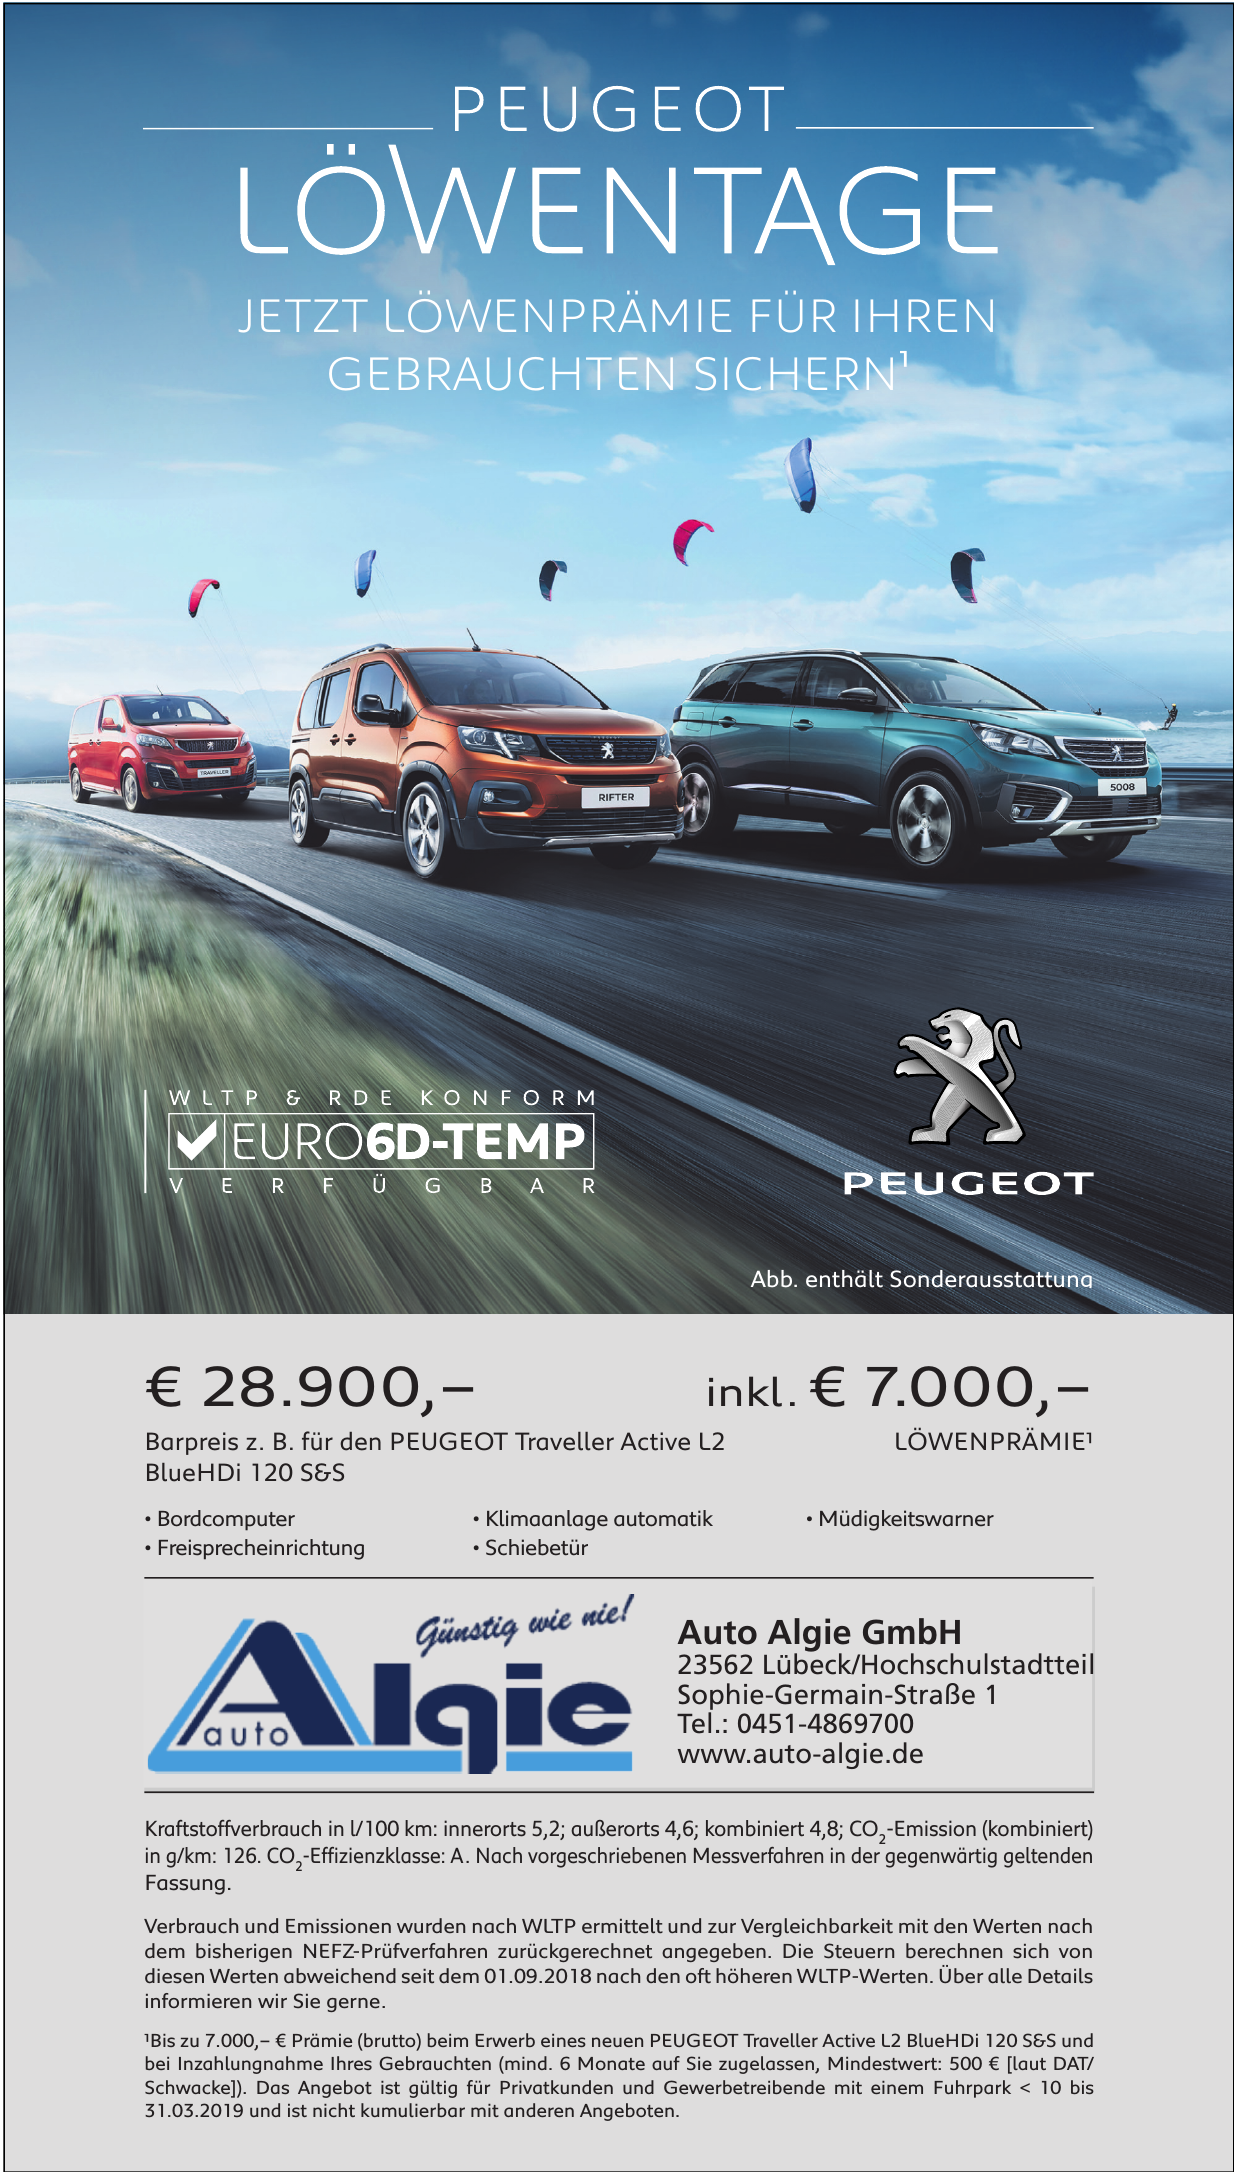 Auto Algie GmbH